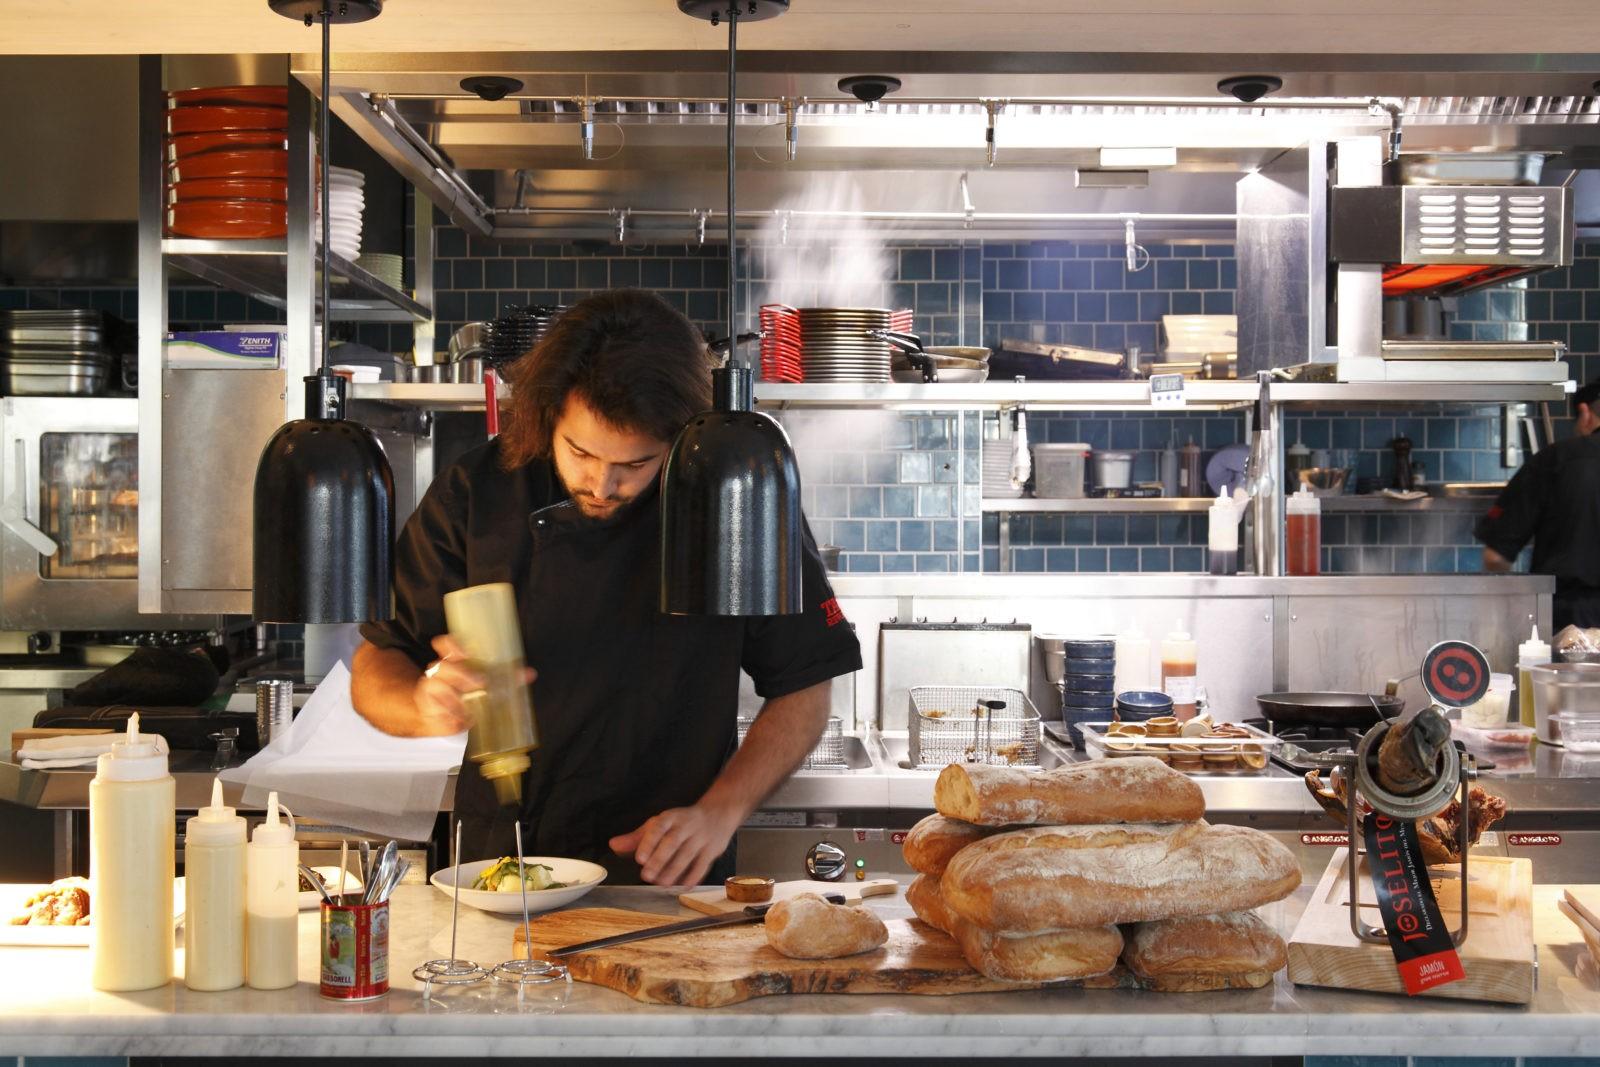 omar-in-tapas-revolution-kitchen